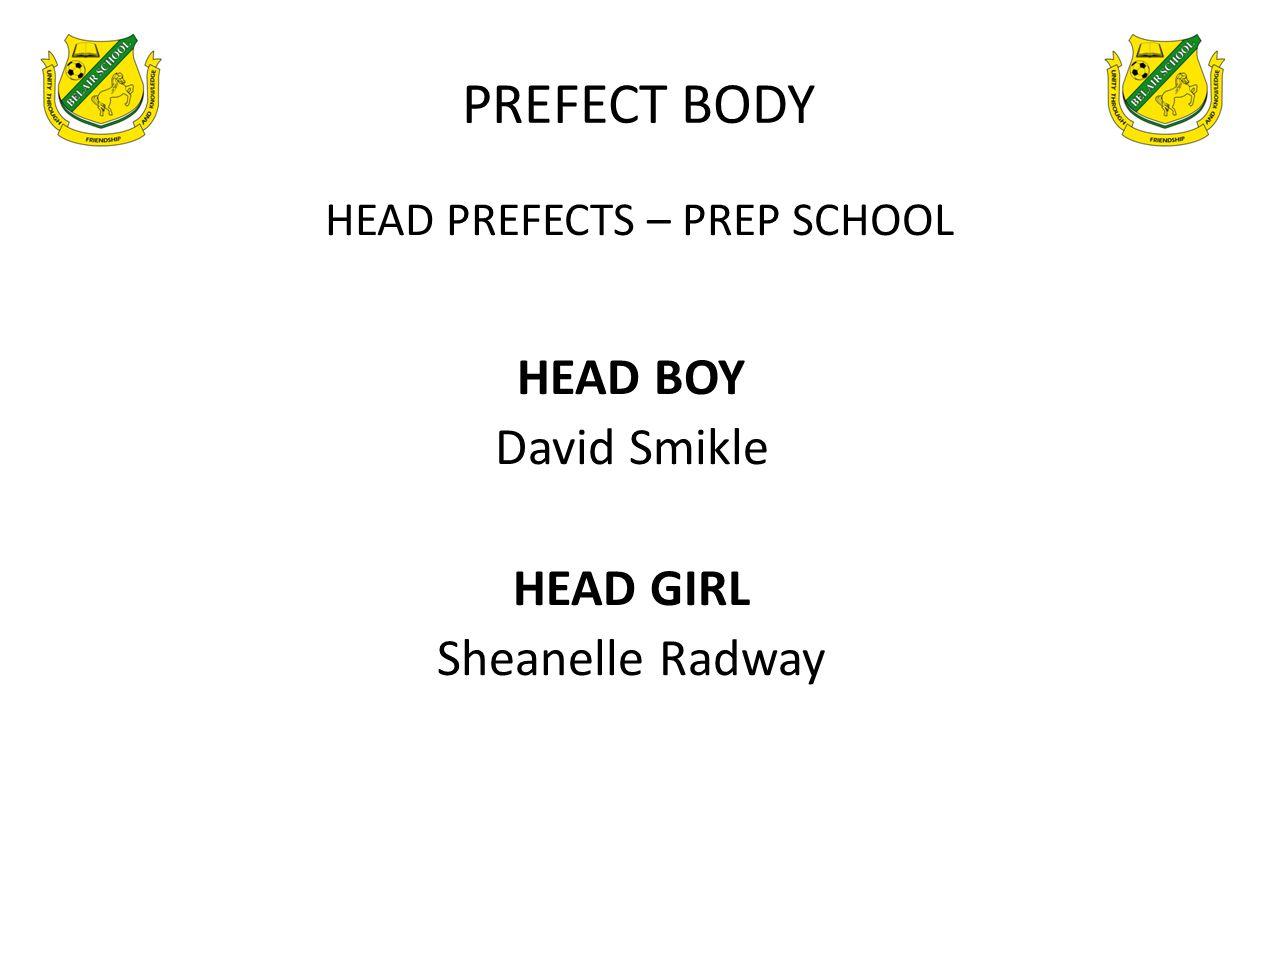 PREFECT BODY HEAD PREFECTS – PREP SCHOOL HEAD BOY David Smikle HEAD GIRL Sheanelle Radway